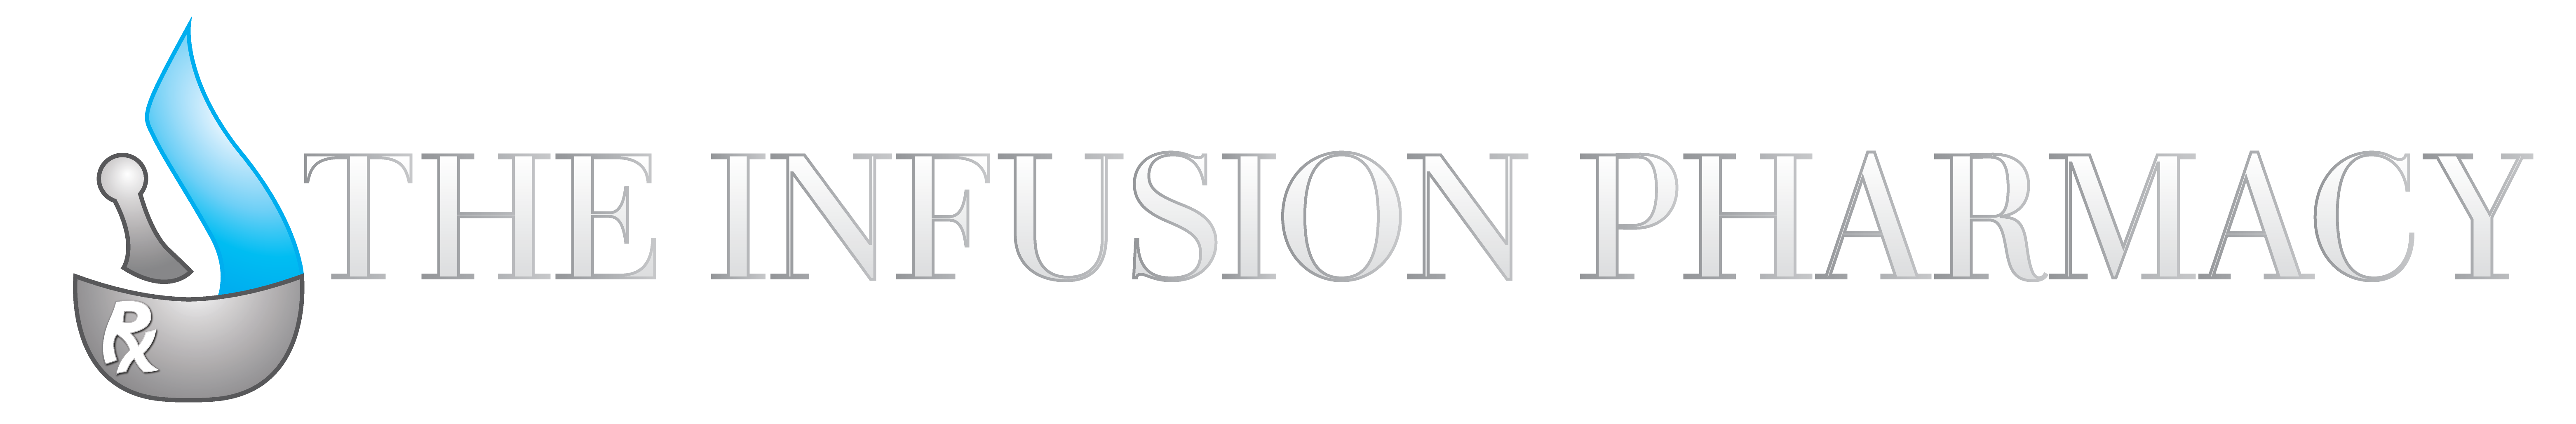 the infusion pharmacy logo